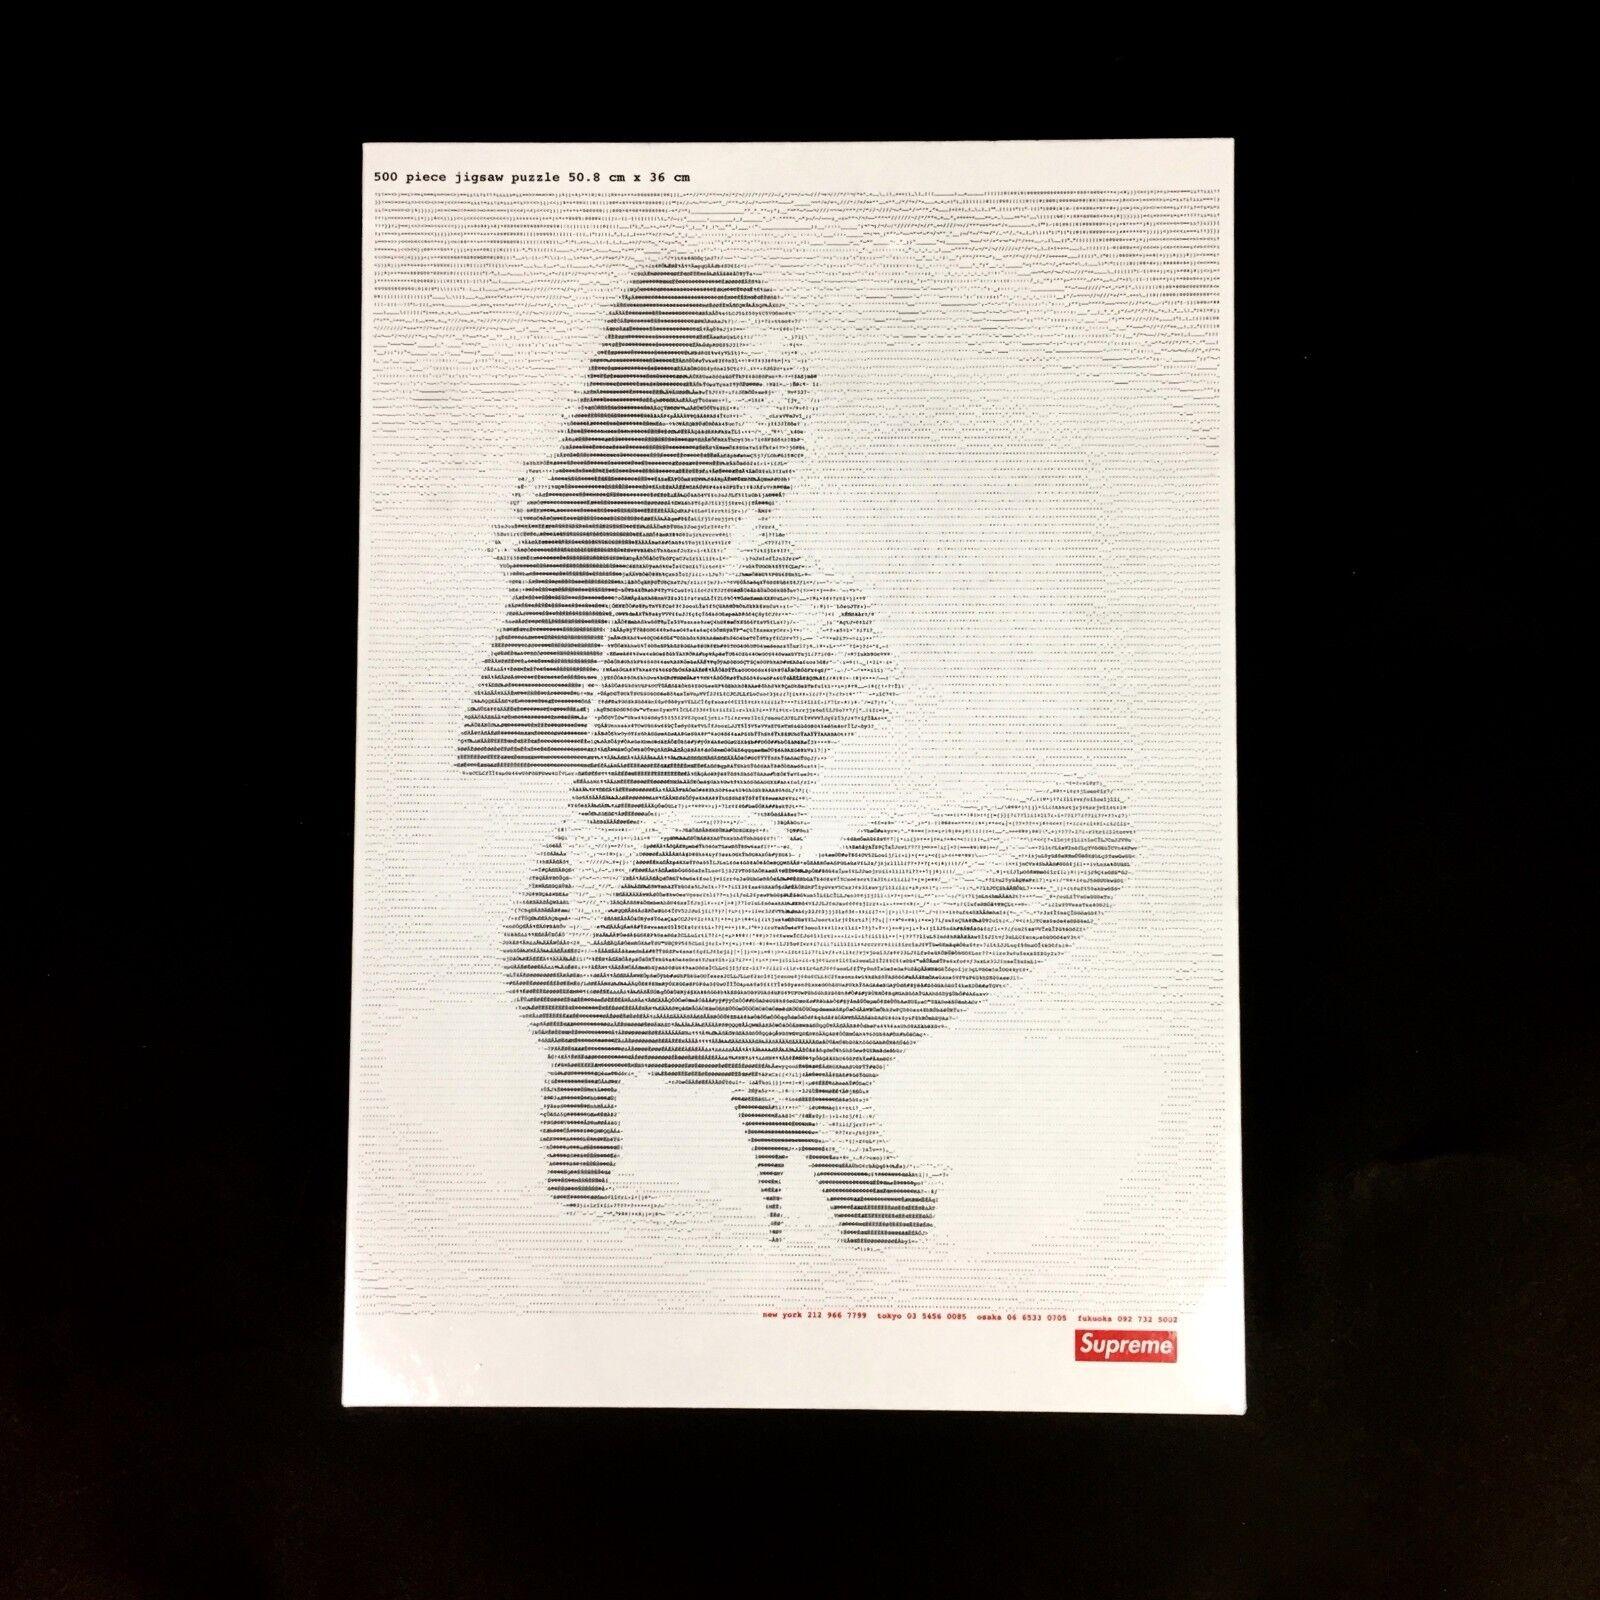 NWT Supreme NY rosso Box Logo Digi Print 500 Piece Jigsaw Puzzle SS17 DS AUTHENTIC